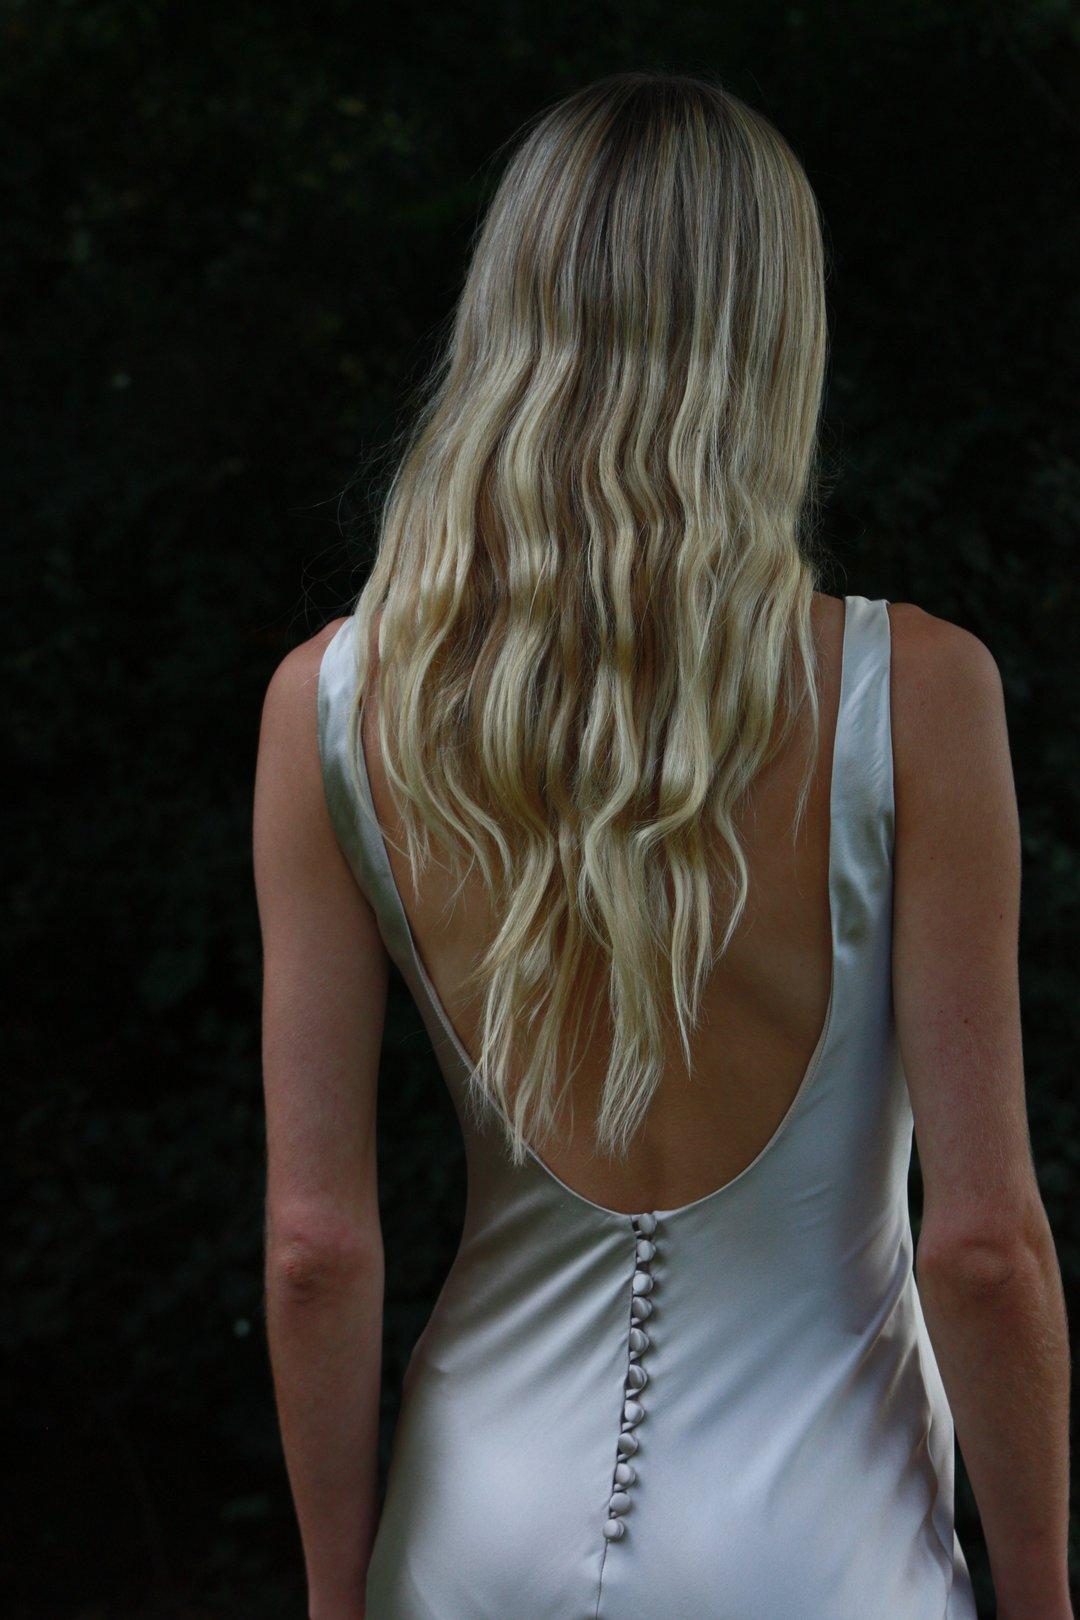 style 008 // champagne slip  dress photo